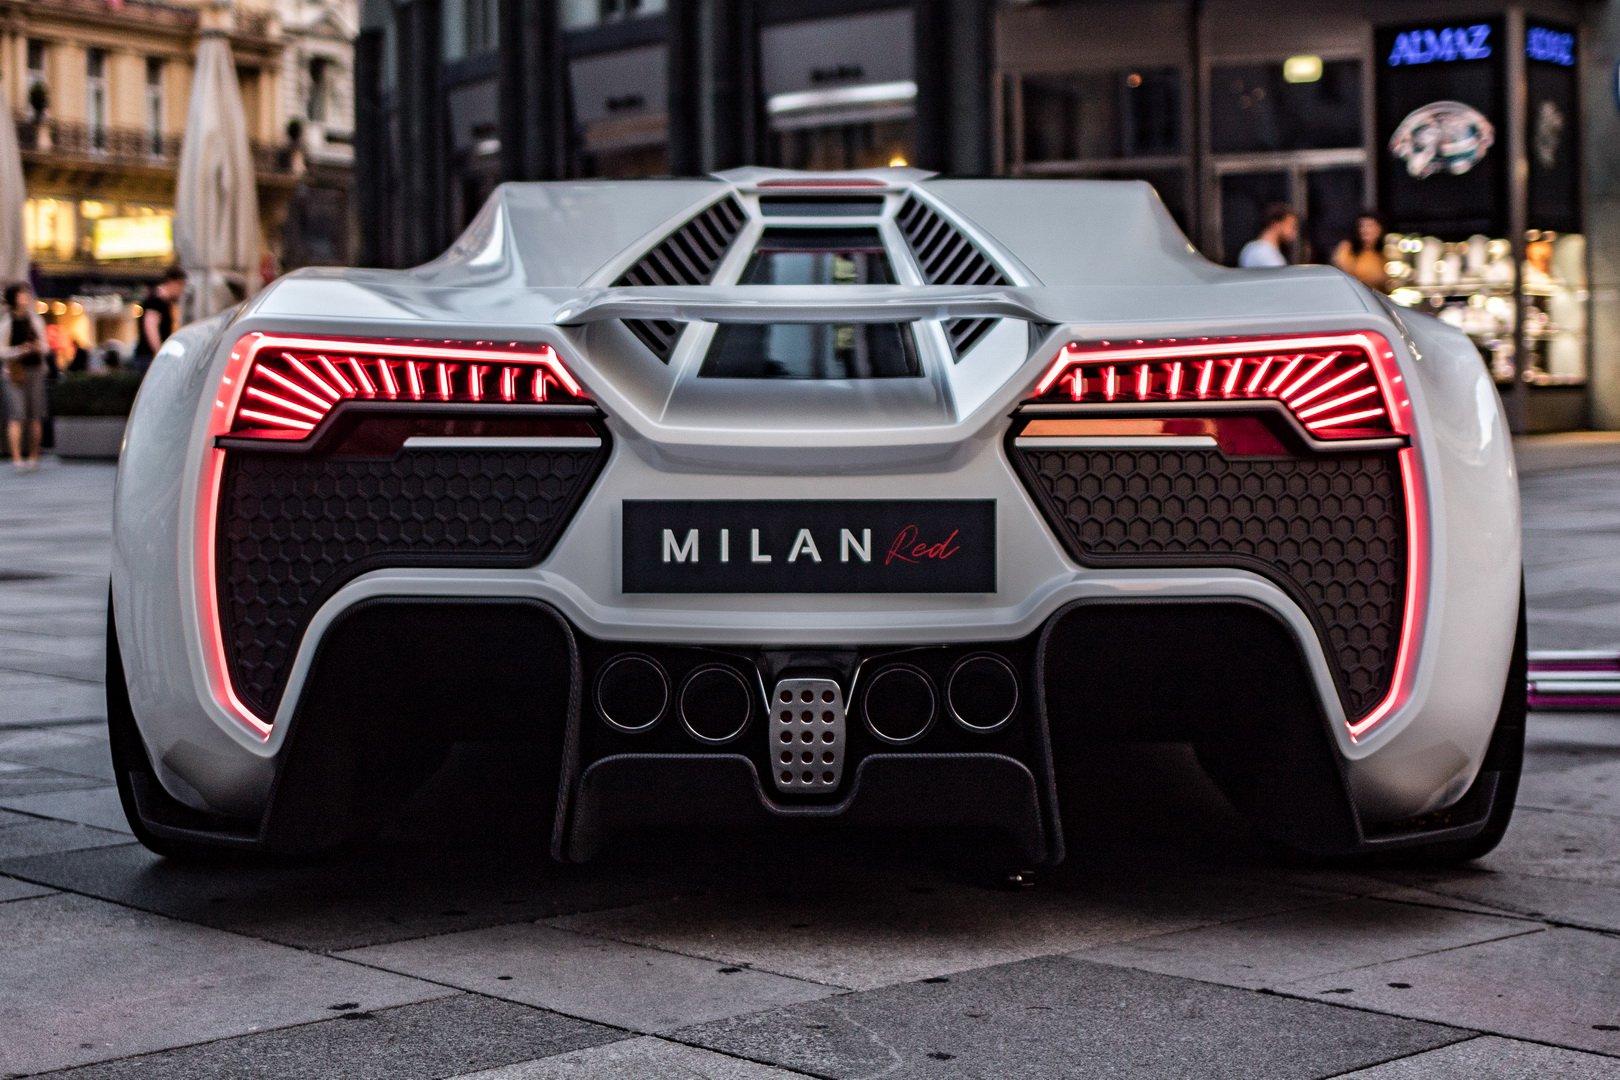 Sieu-xe-Milan-Red-hoan-tona-moi-gay-choang-voi-suc-can-luot-1306-ma-luc-anh-7